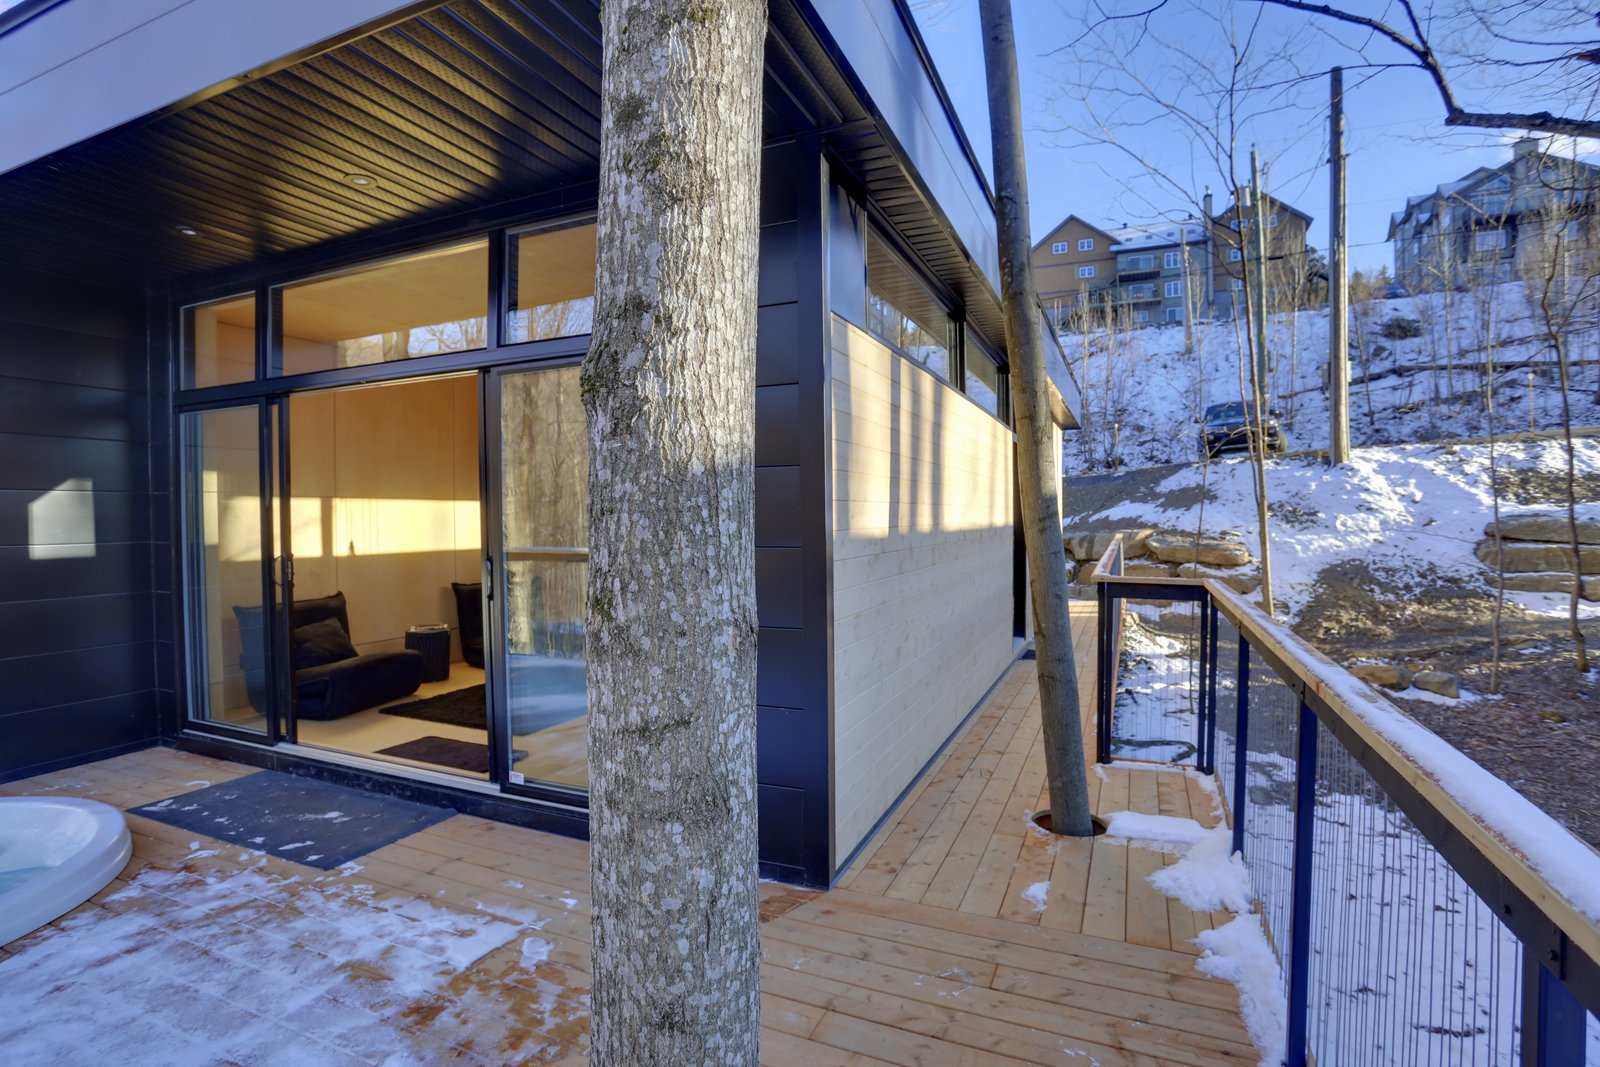 Winter Exterior Shot